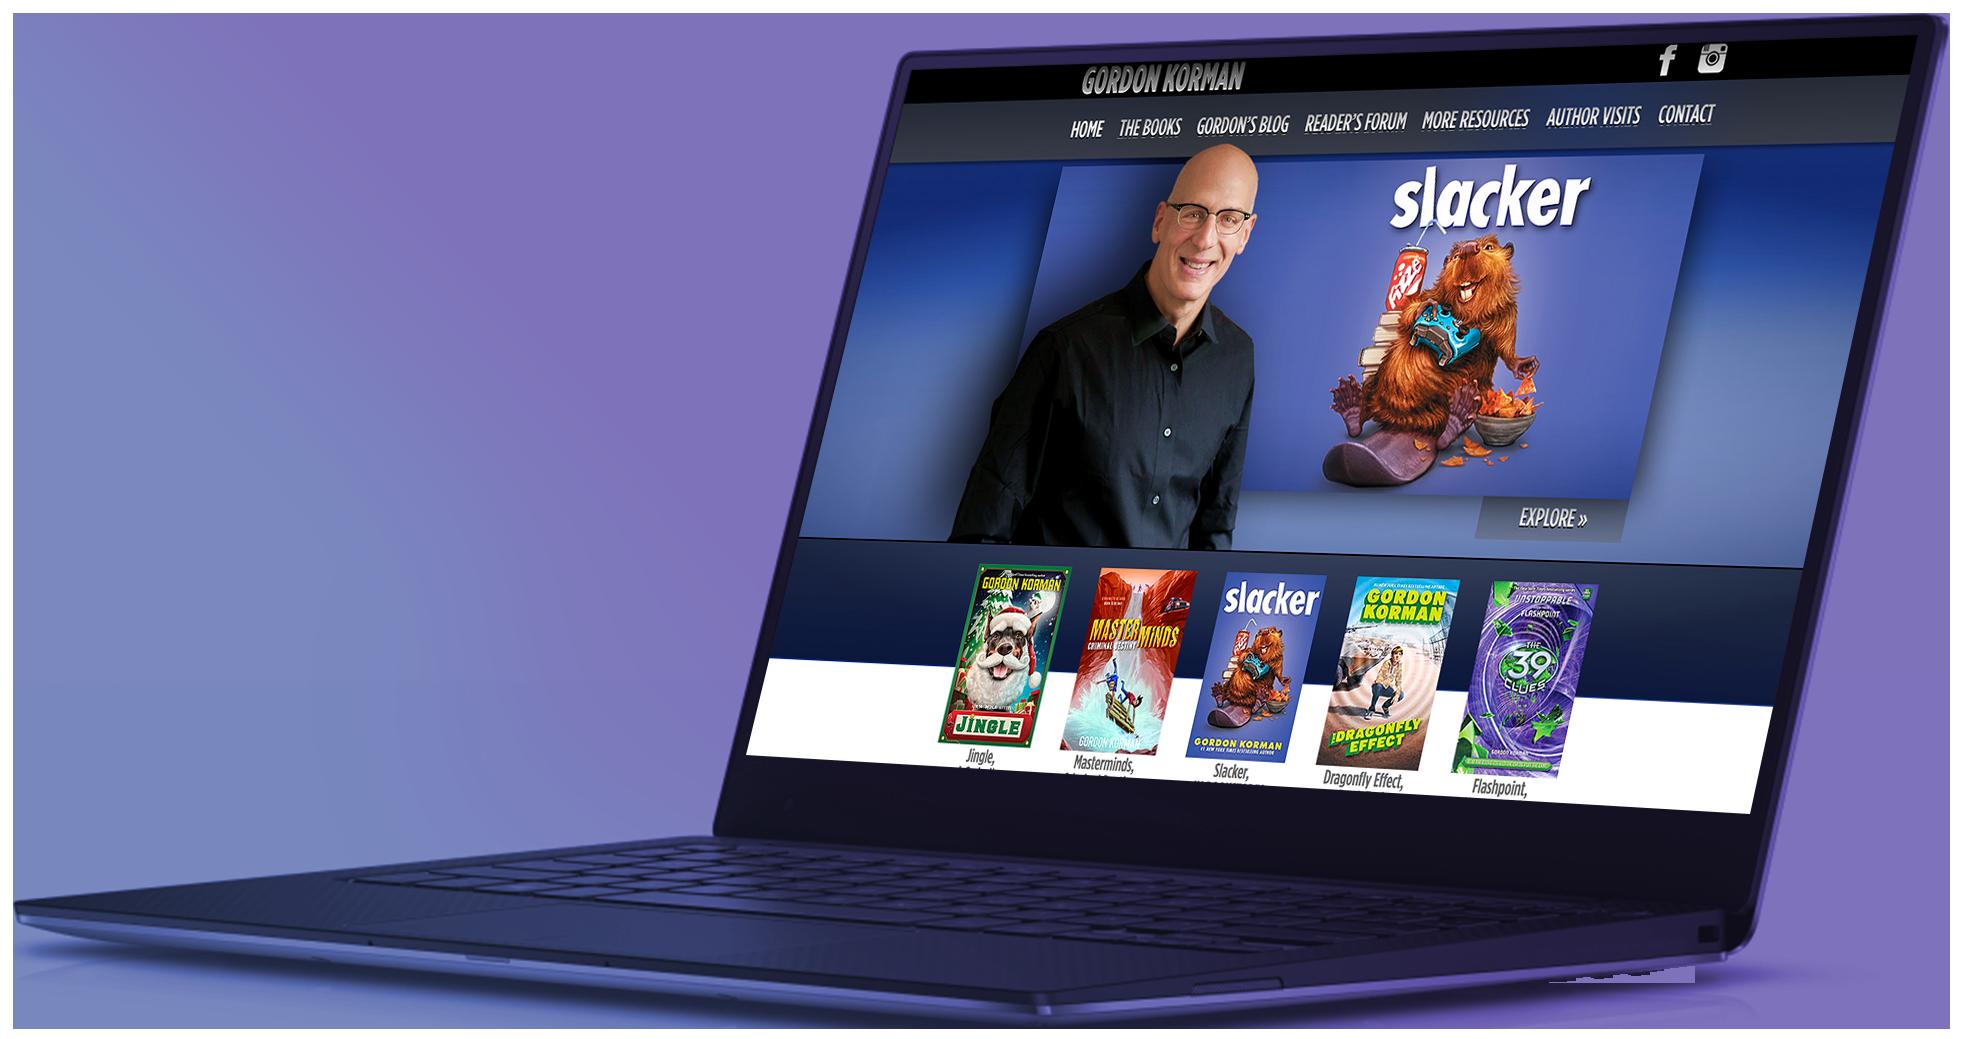 Slacker - 4 GordonKorman.com Website States in Dell Laptop Frame 0032.png